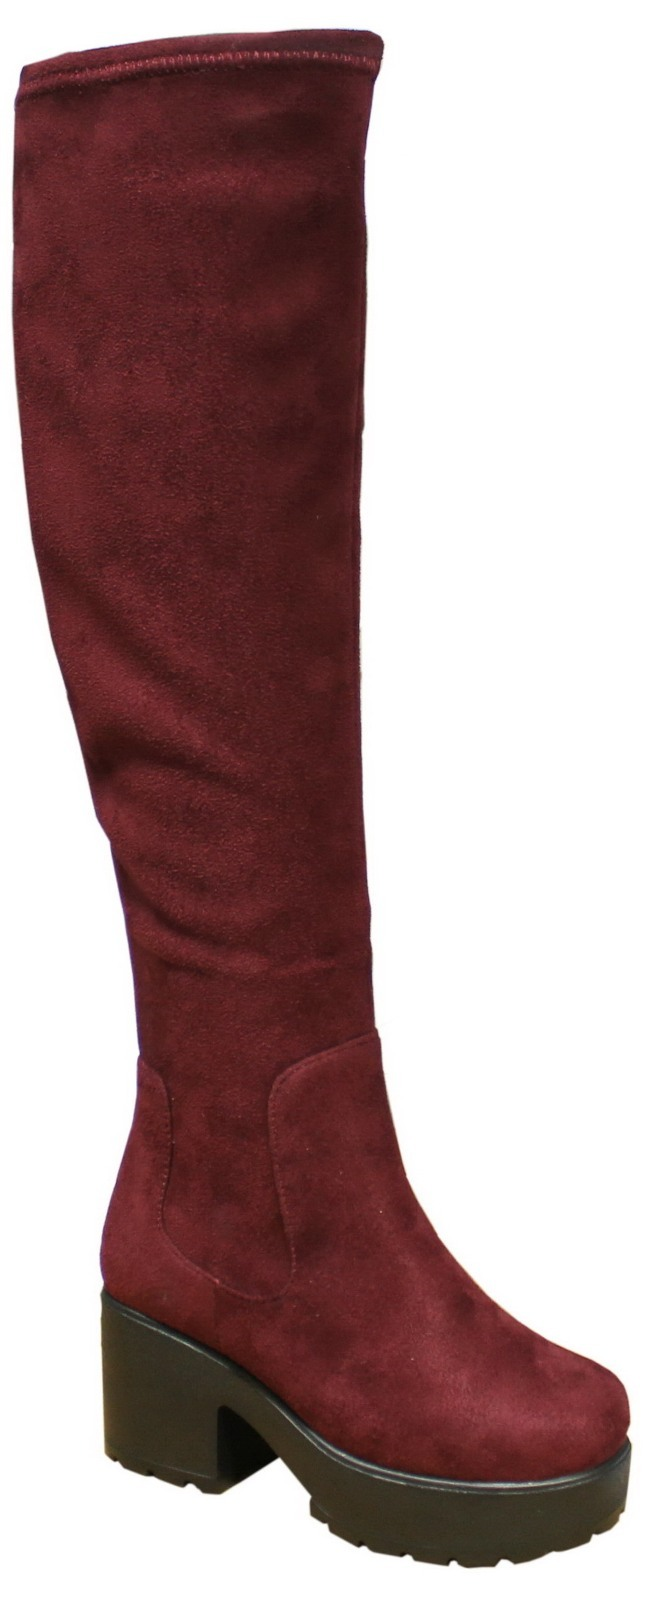 Kids Girls Chunky Block Heel Chelsea Over Knee High Boots ...